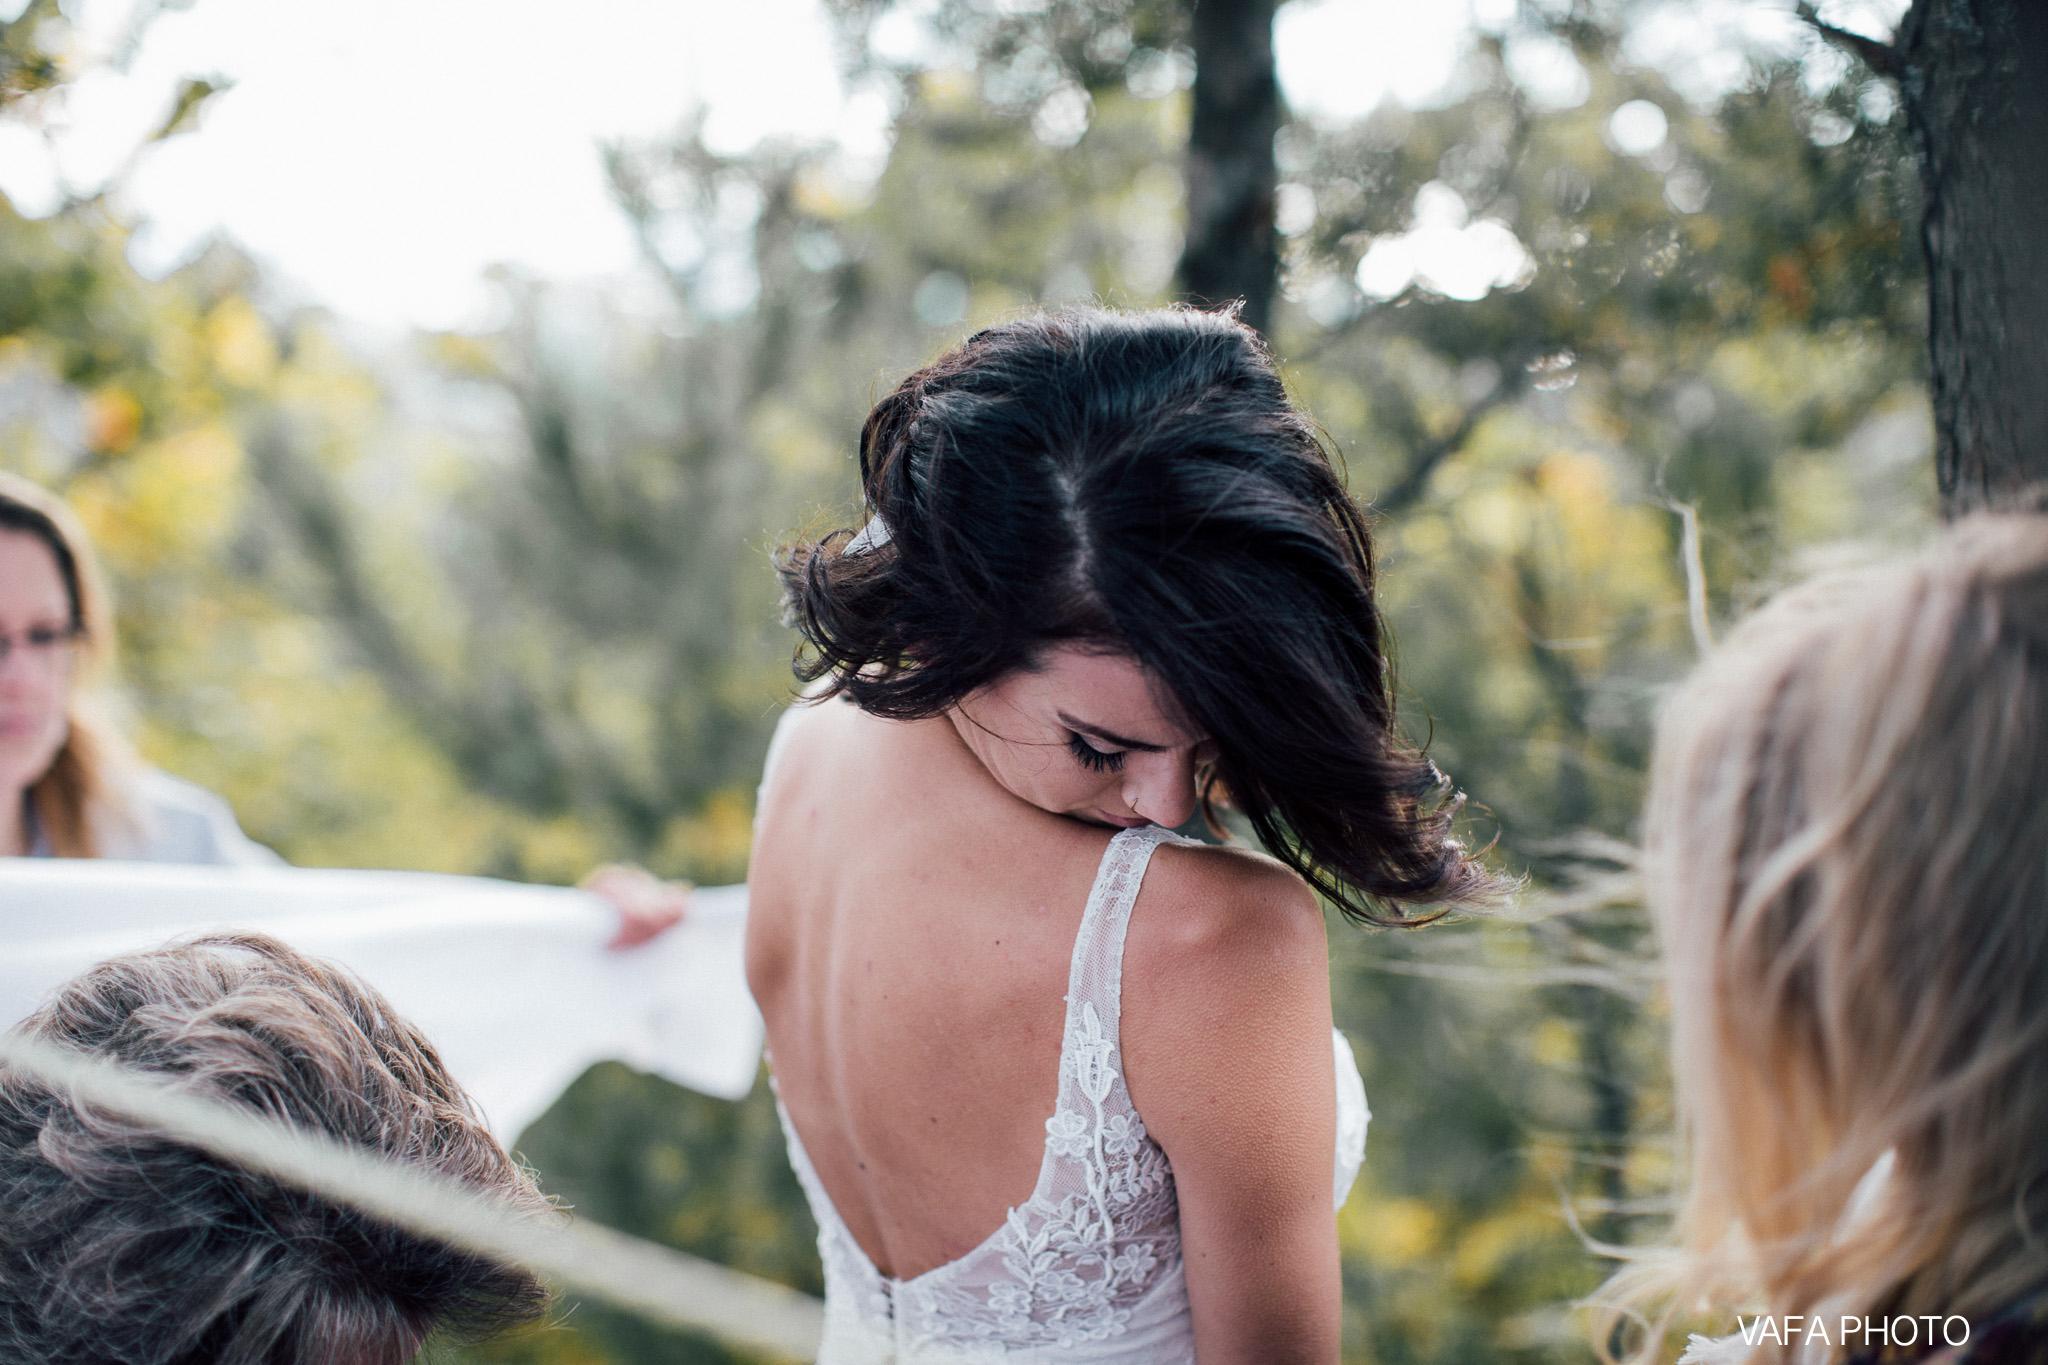 Hogback-Mountain-Wedding-Chelsea-Josh-Vafa-Photo-67.jpg